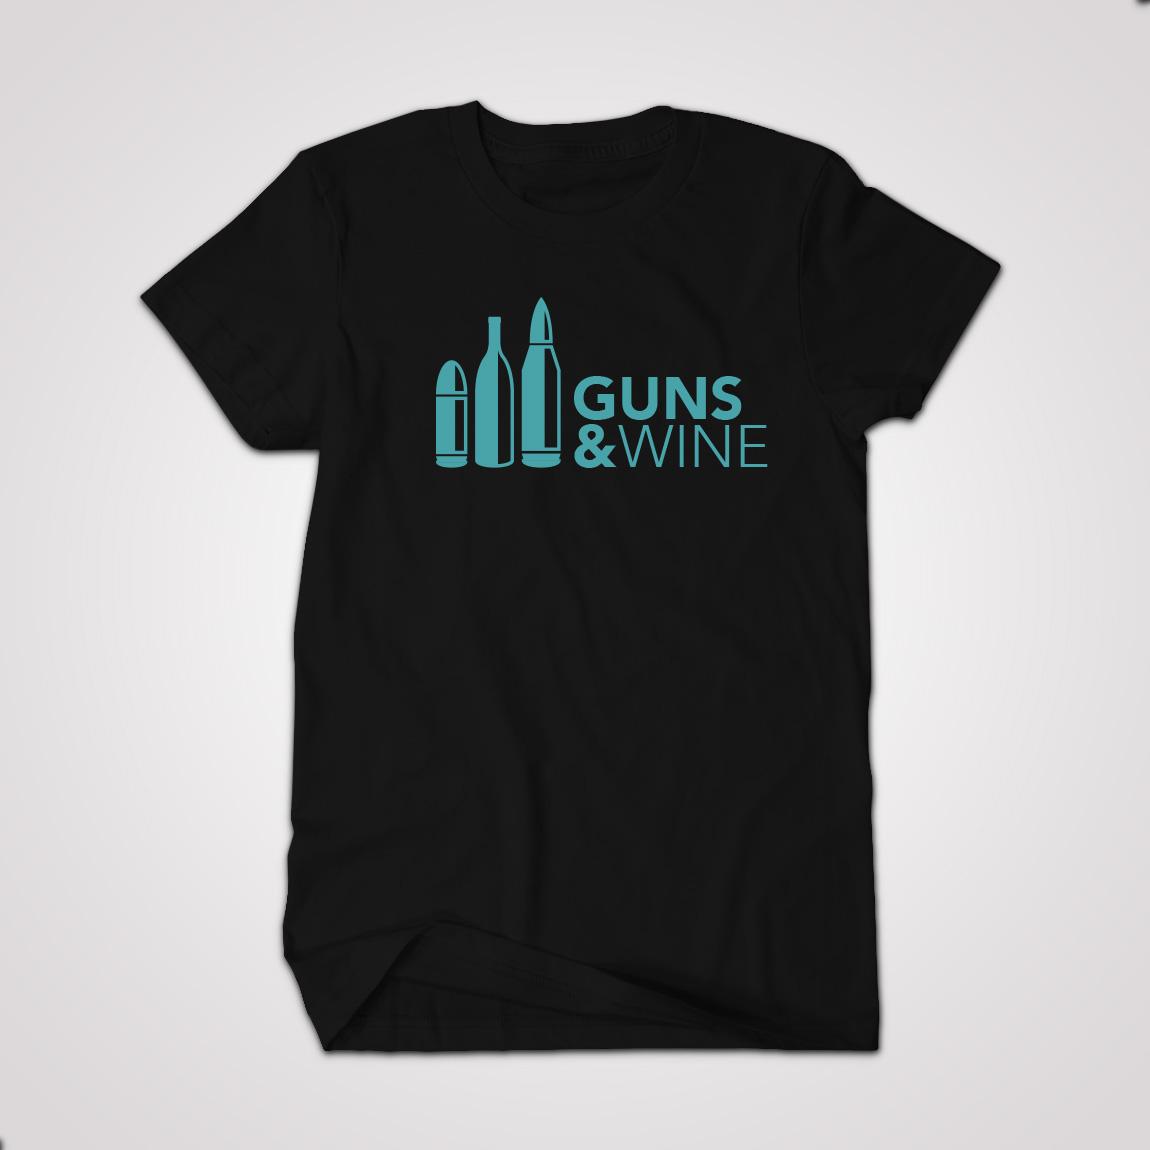 Guns&Wine-Logo-on-Shirts-Black.jpg